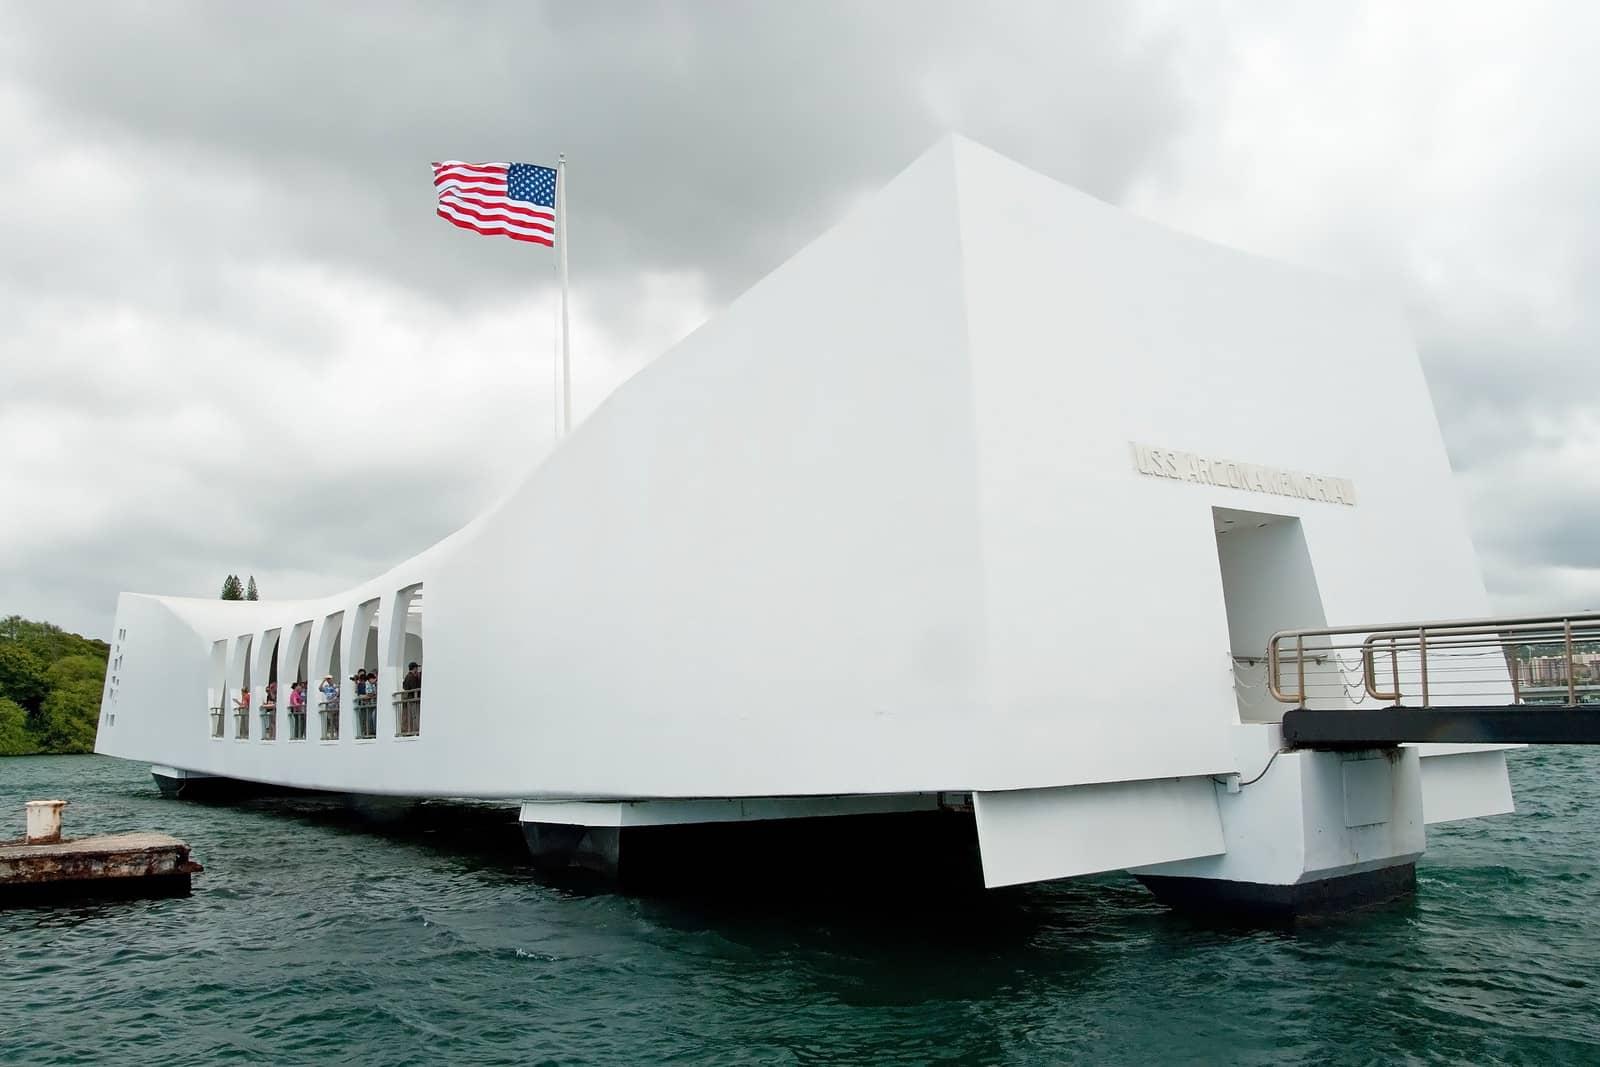 Pearl Harbor Private Tour by Jeep, SUV or Mini Coach - Pearl